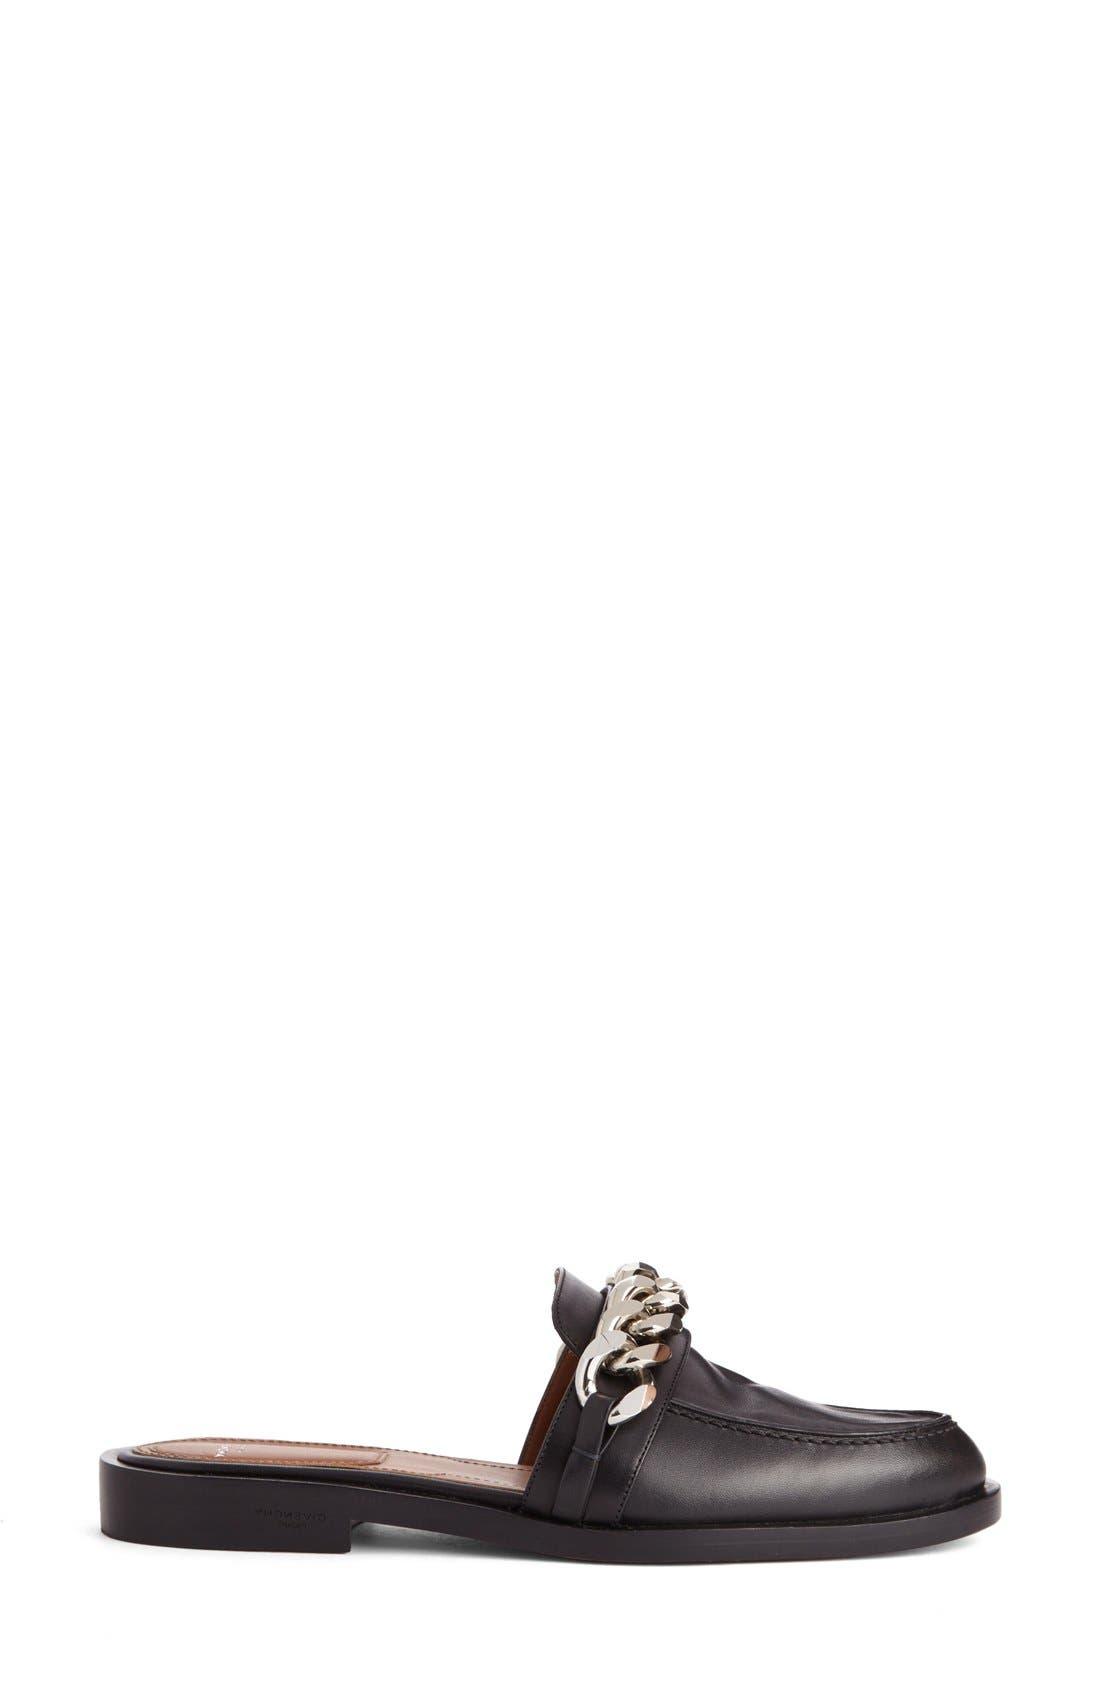 Chain Strap Loafer Mule,                             Alternate thumbnail 4, color,                             Black